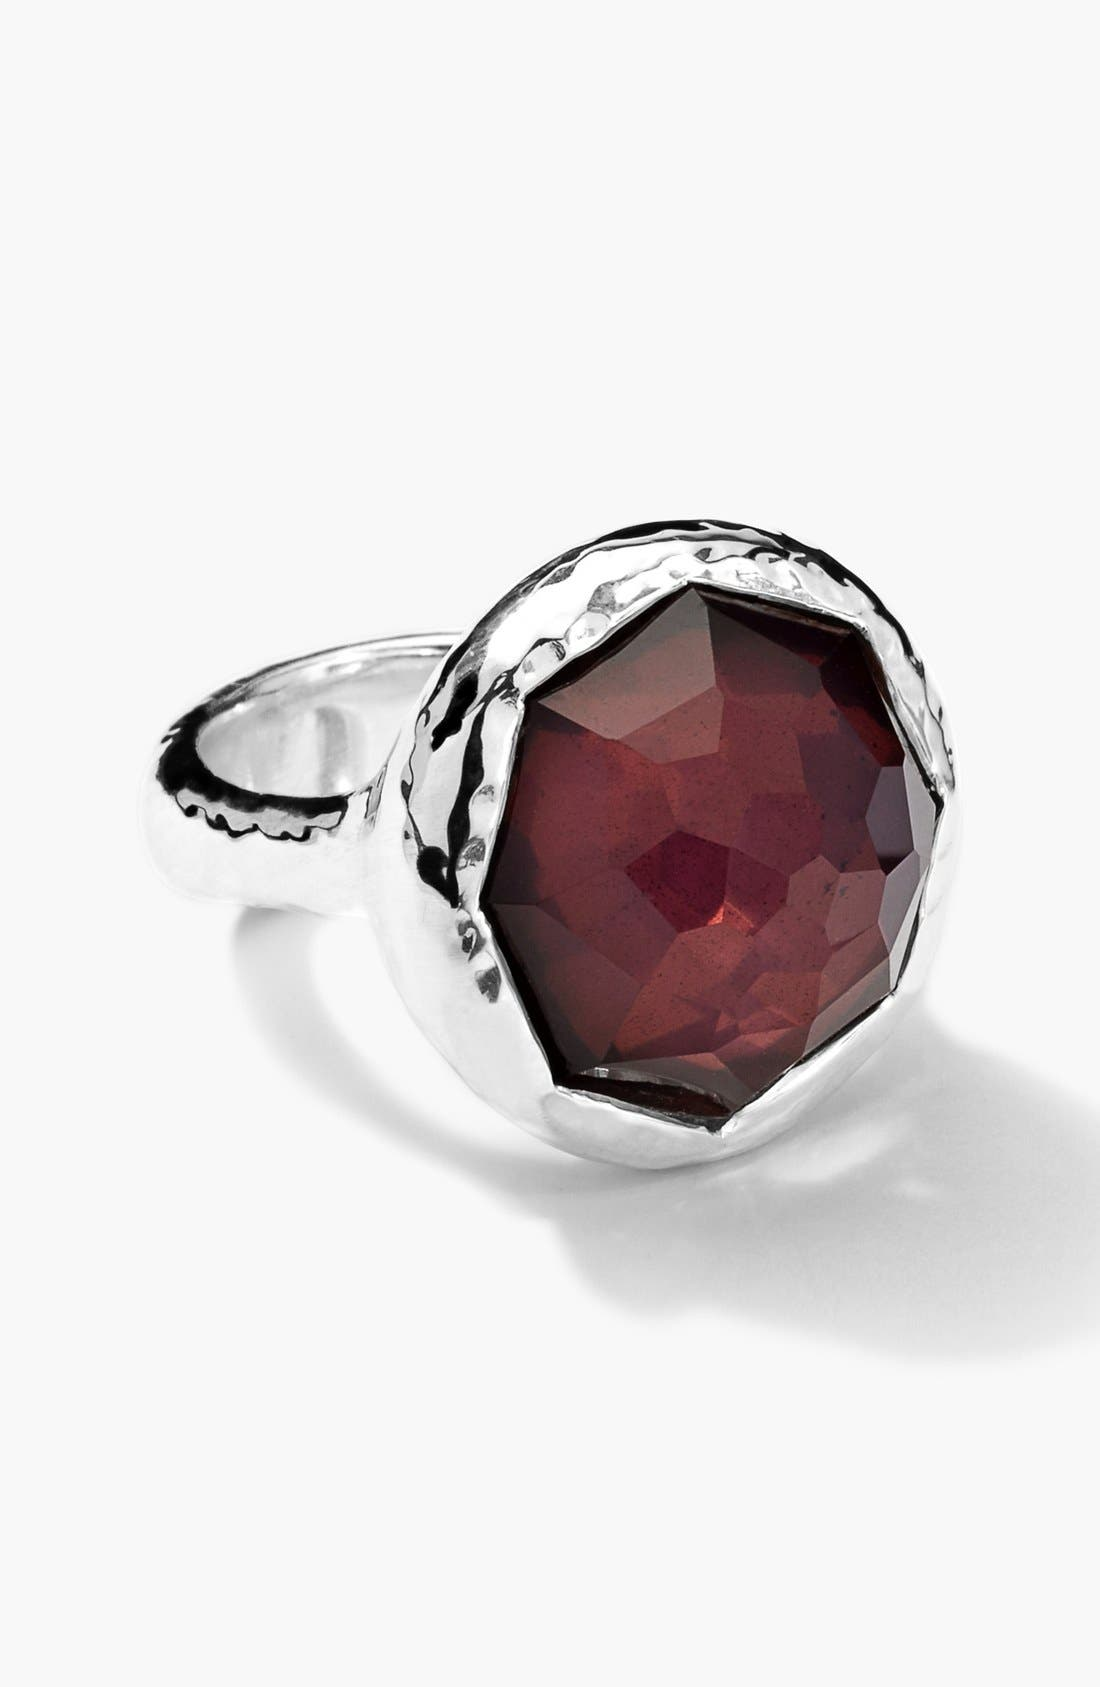 Alternate Image 1 Selected - Ippolita 'Wonderland' Doublet Ring (Nordstrom Exclusive)